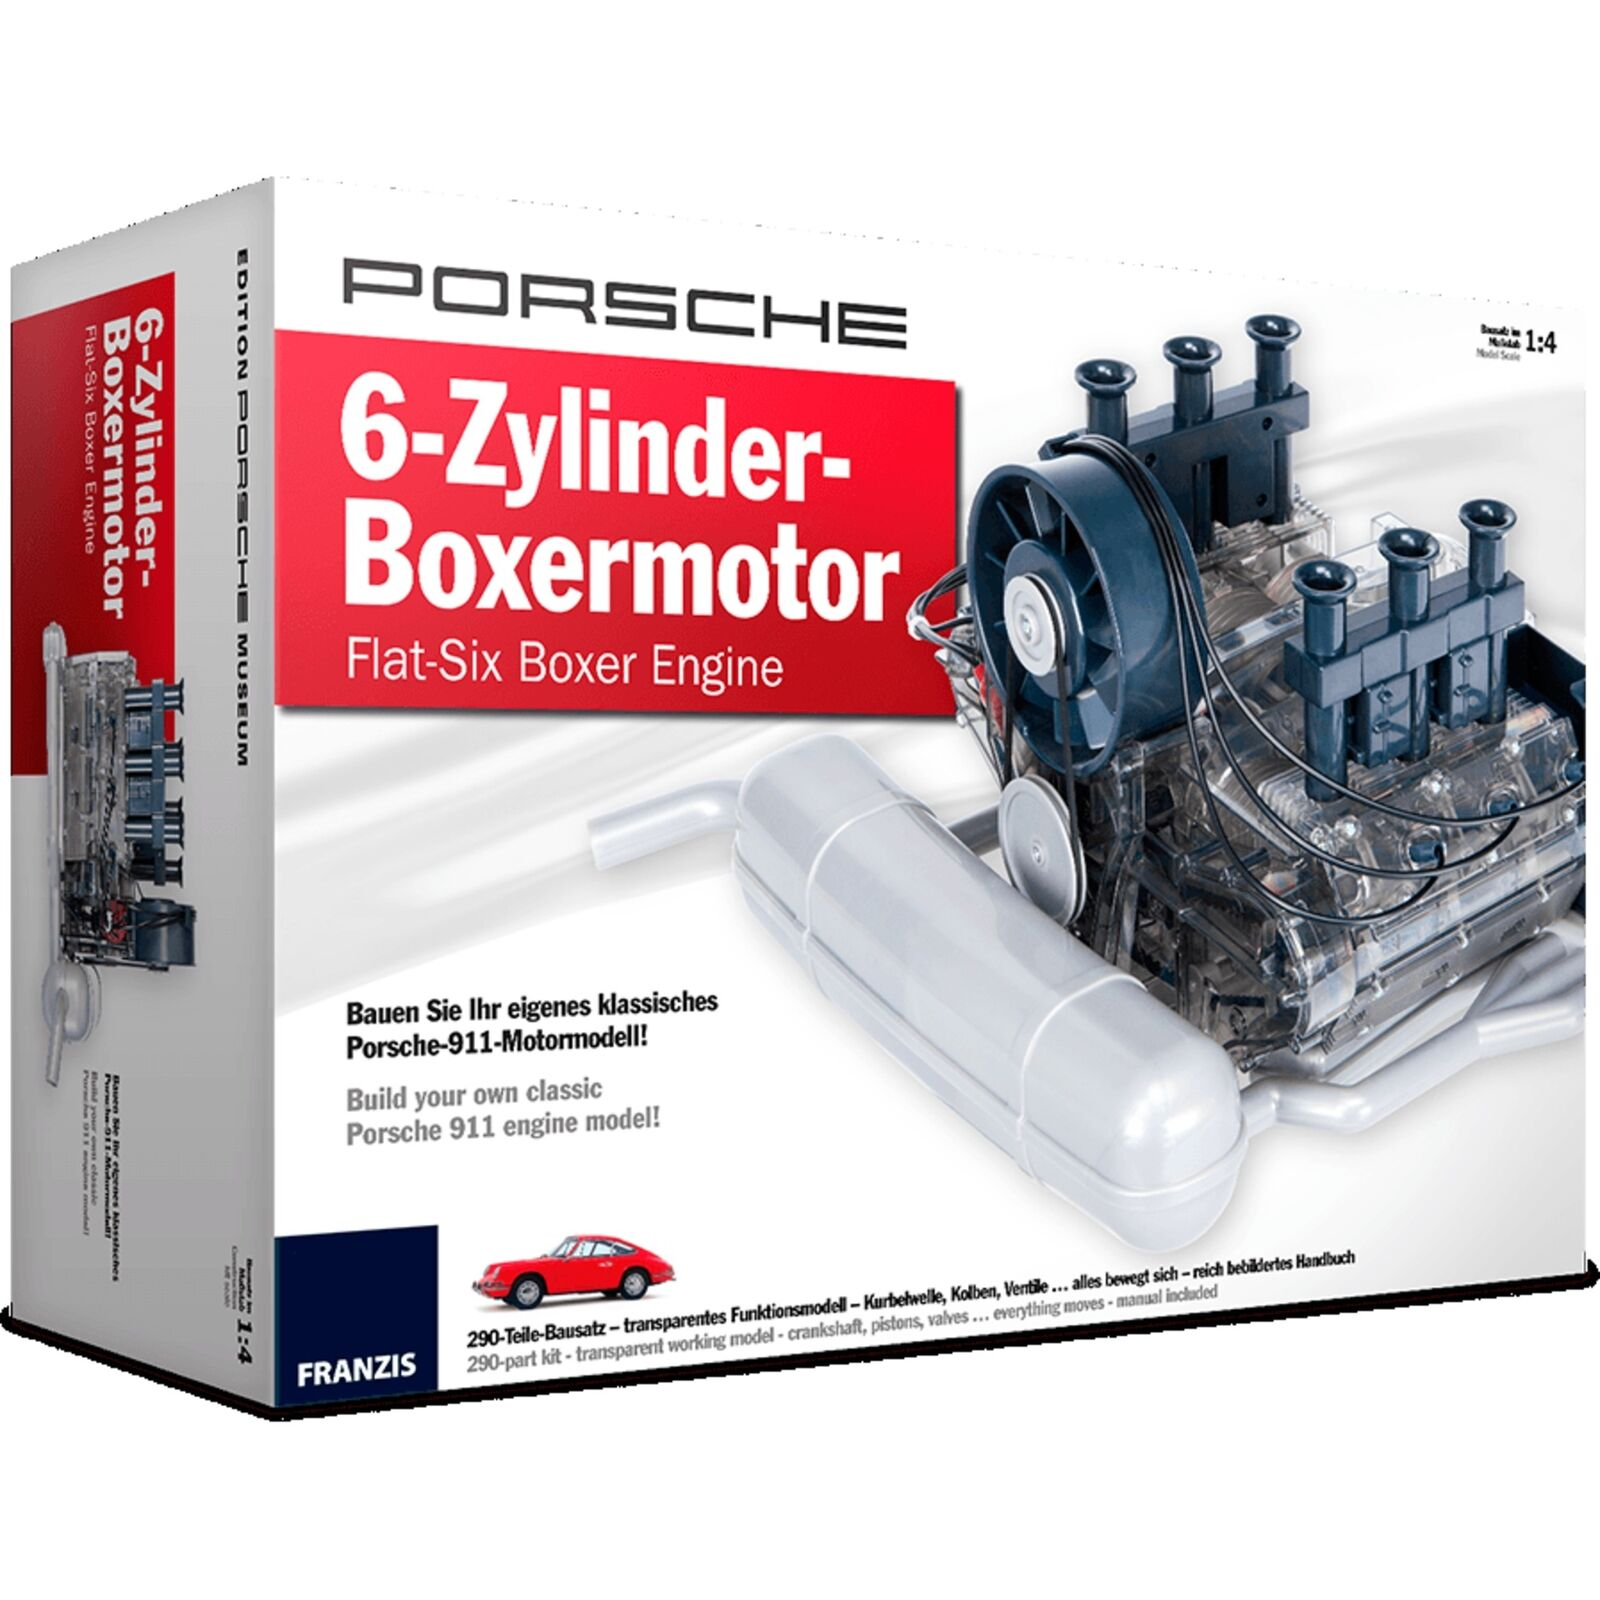 Franzis Porsche 6-Zylinder Boxermotor Modellfahrzeug